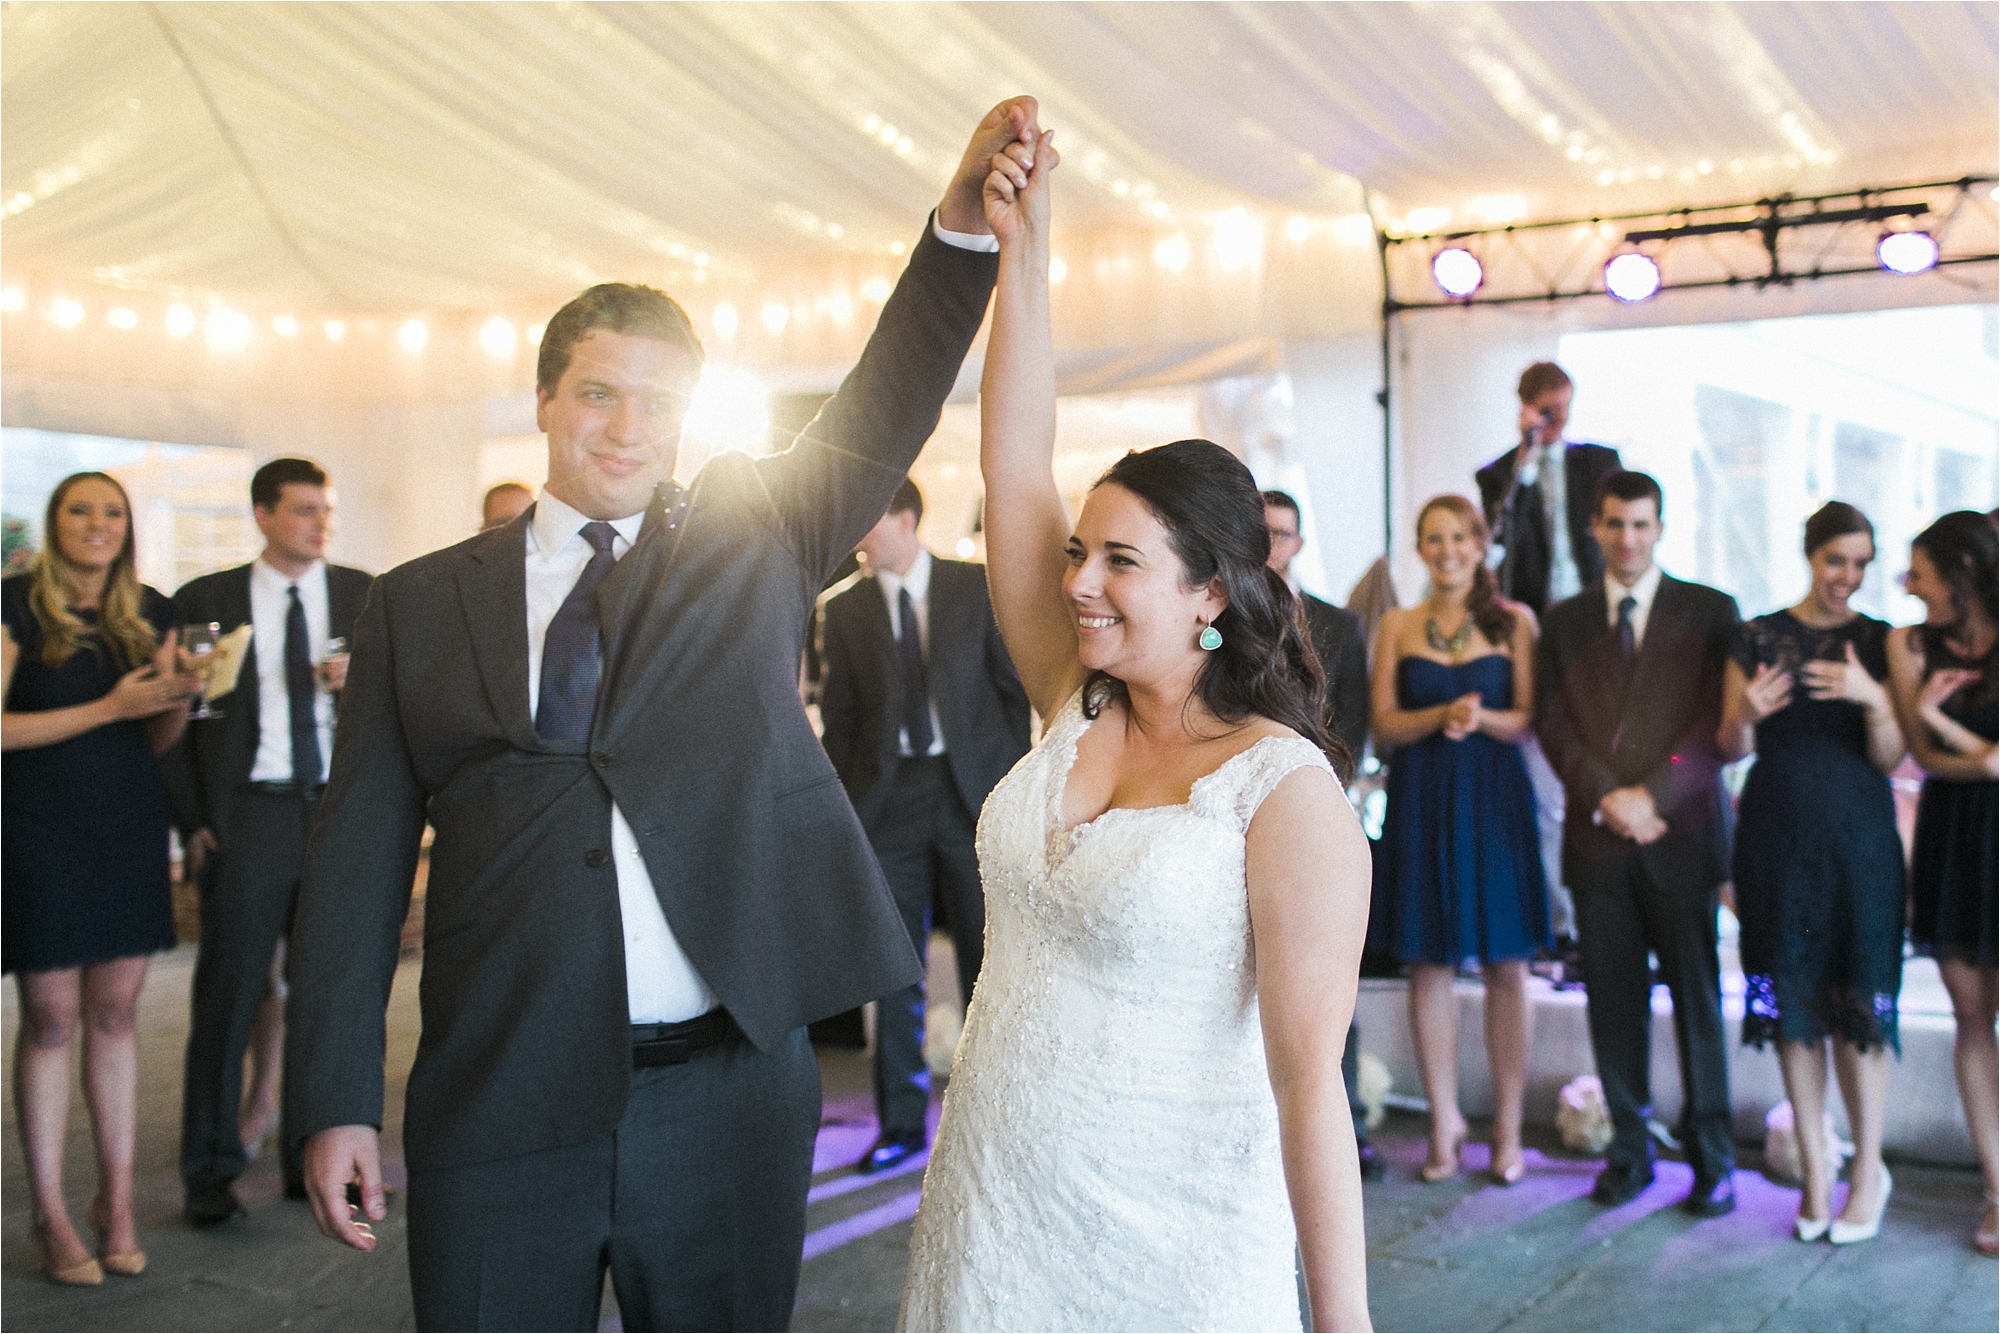 tom-jill-baltimore-maryland-industrial-elegant-wedding-049.JPG